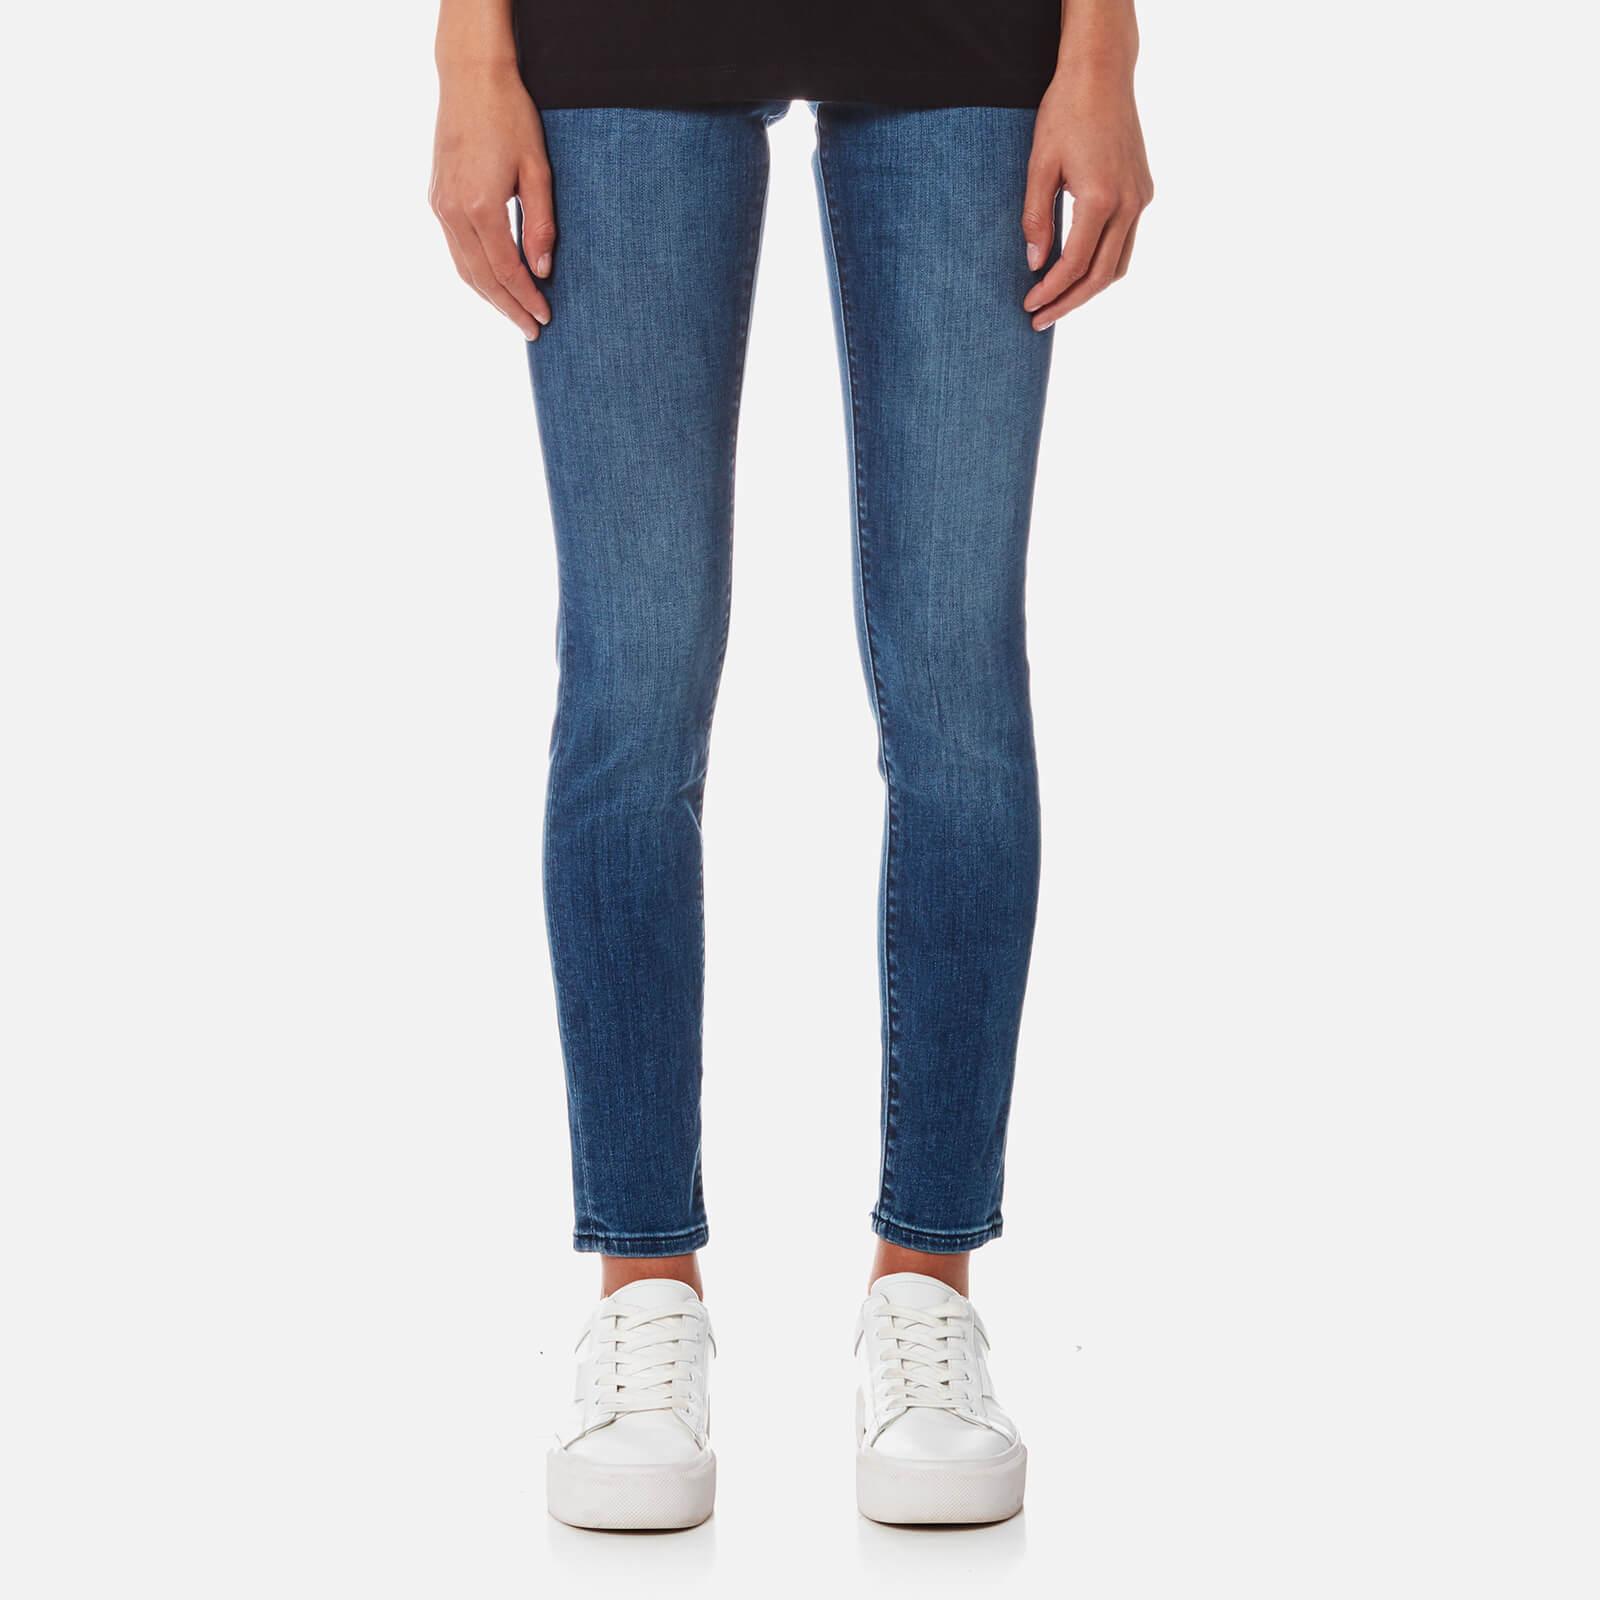 Calvin Klein Women's Mid Rise Skinny Jeans - Wonder Mid - W27/L30